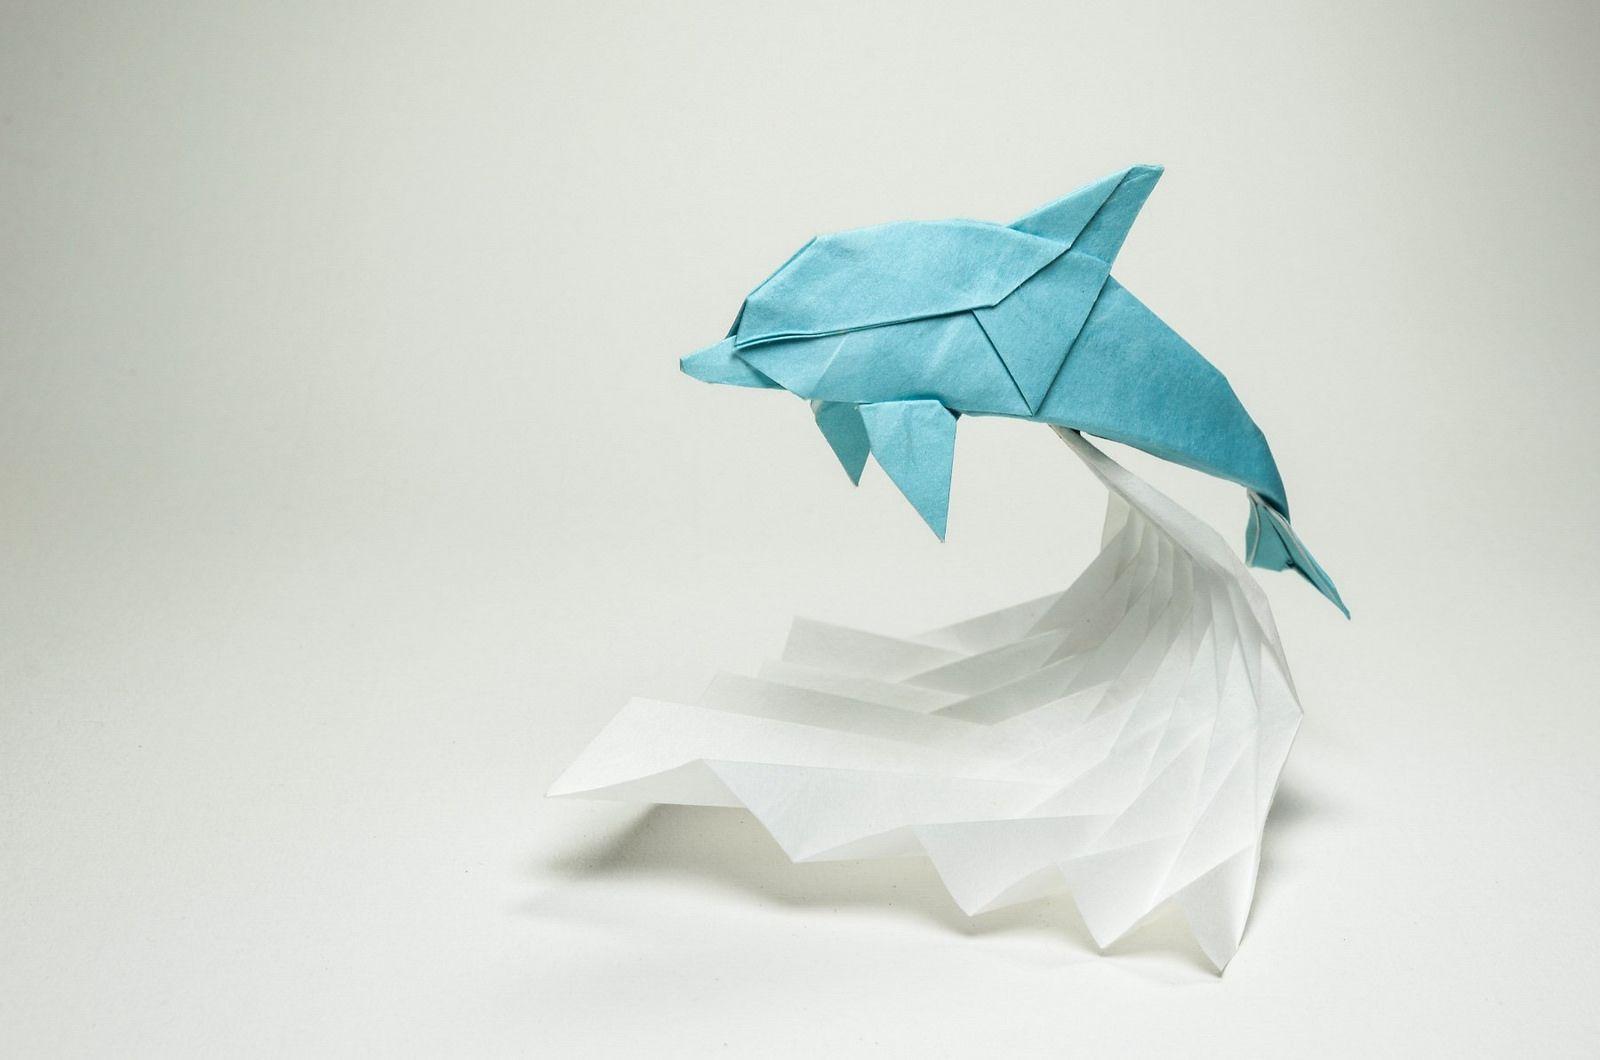 Dolphin 2015 Paper Creations Pinterest Origami Ratrat Origamiorigami Rat Diagram Guide By Ori Q Craft Crafts